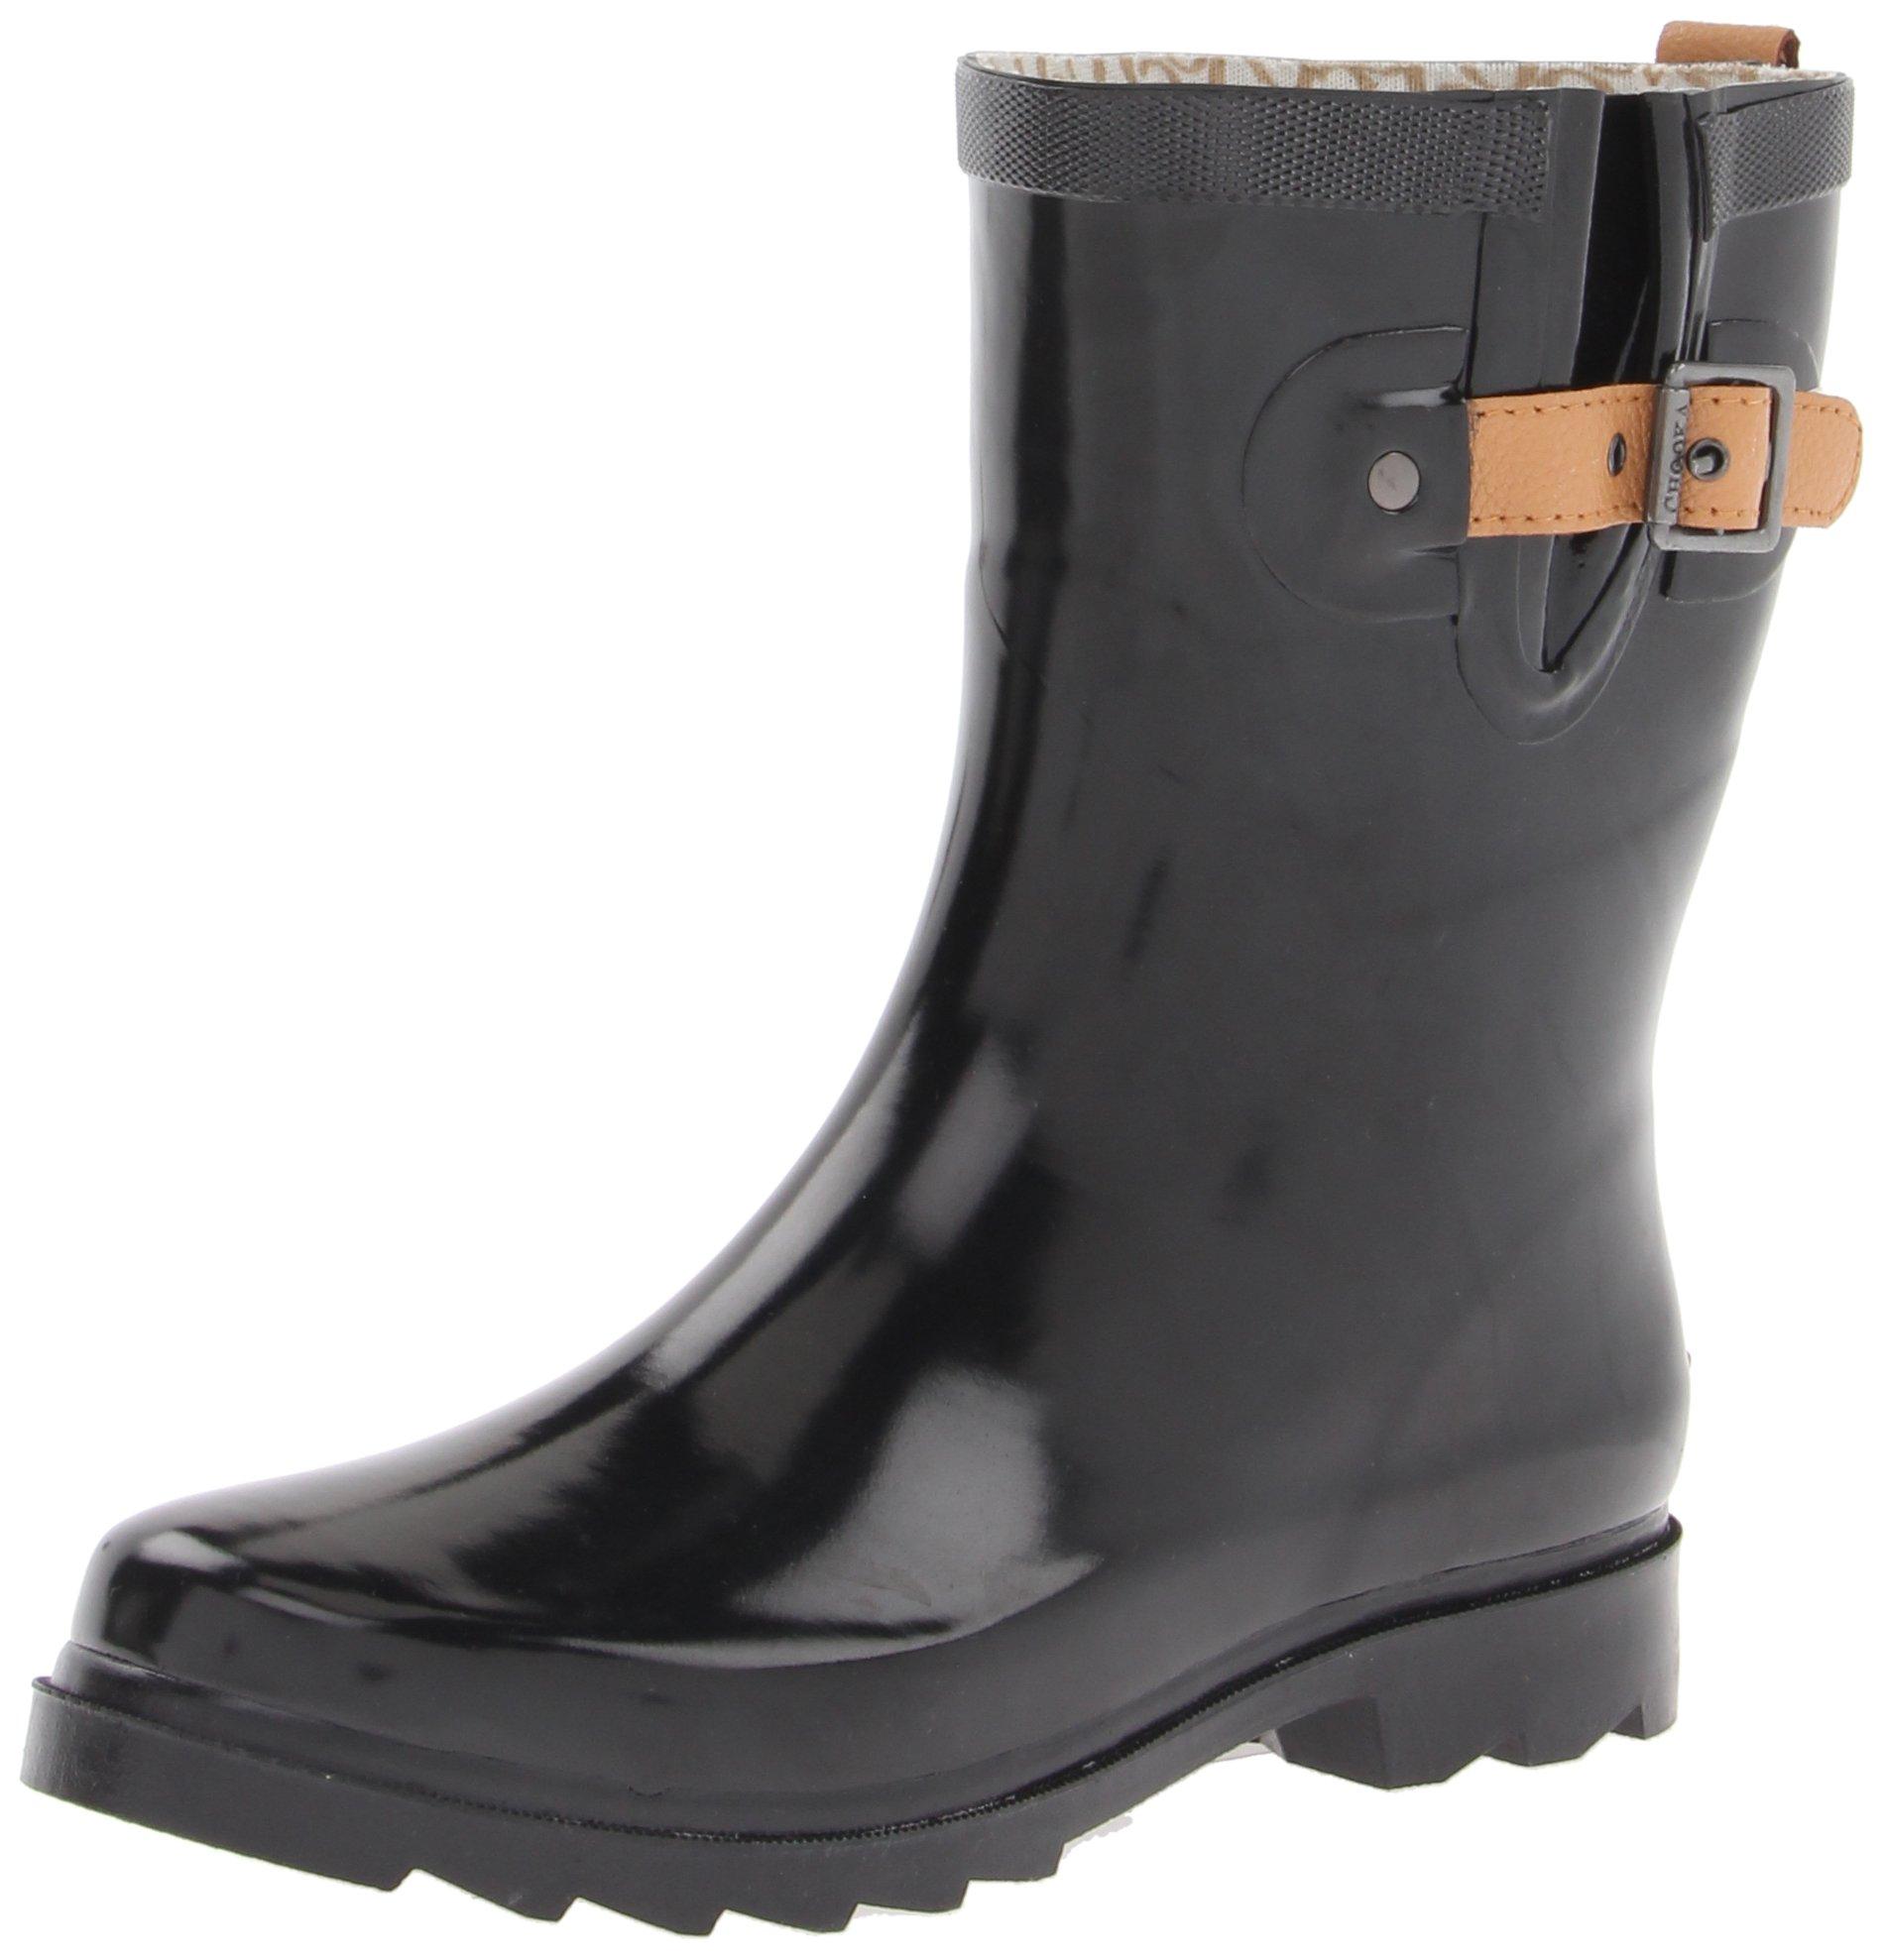 Chooka Women's Mid-Height Rain Boot, Black/Shiny, 10 M US